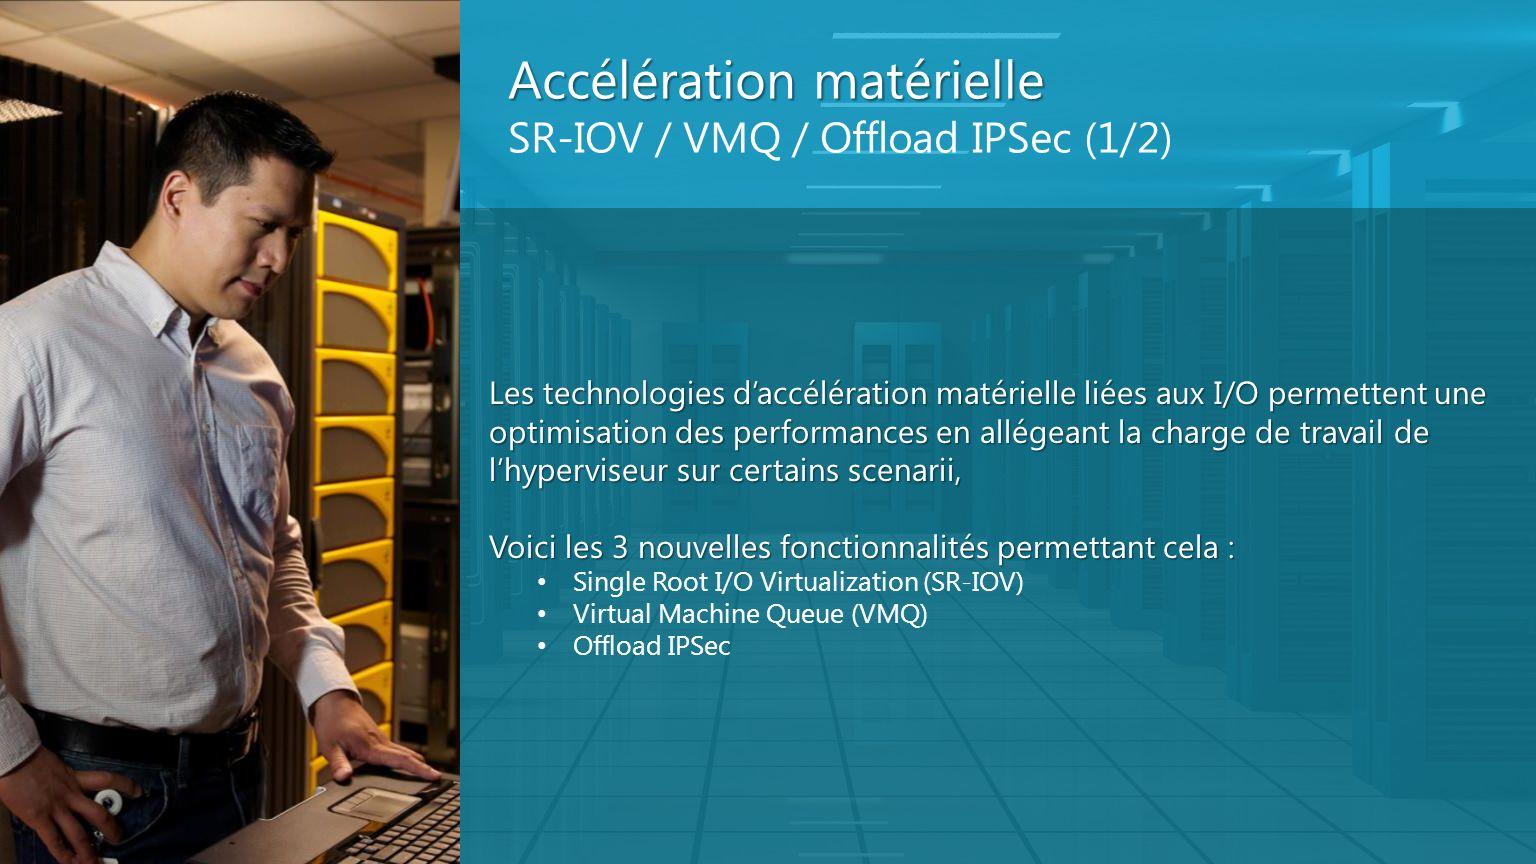 Accélération matérielle SR-IOV / VMQ / Offload IPSec (1/2)